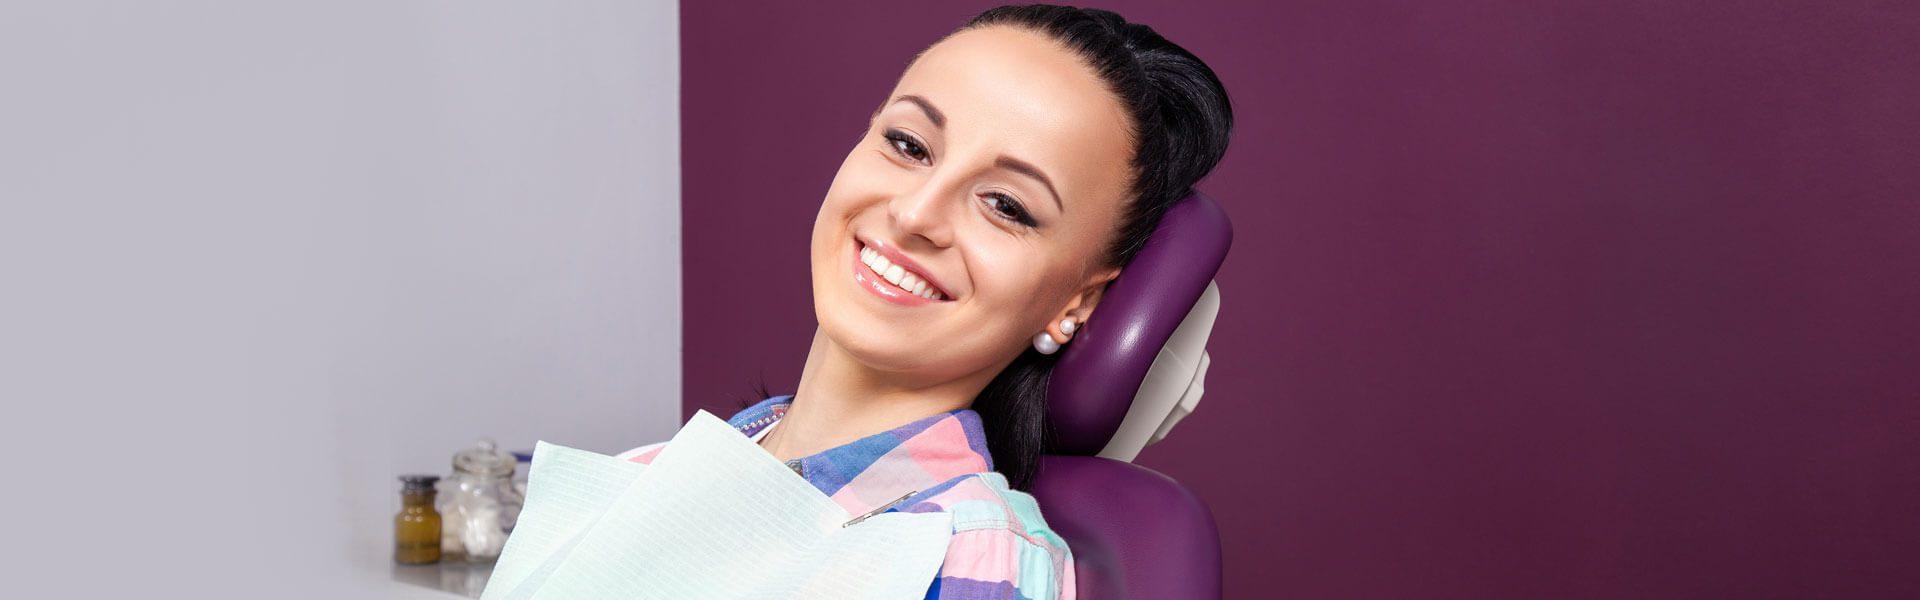 Effects of Regular Dental Checkup On Dental Health